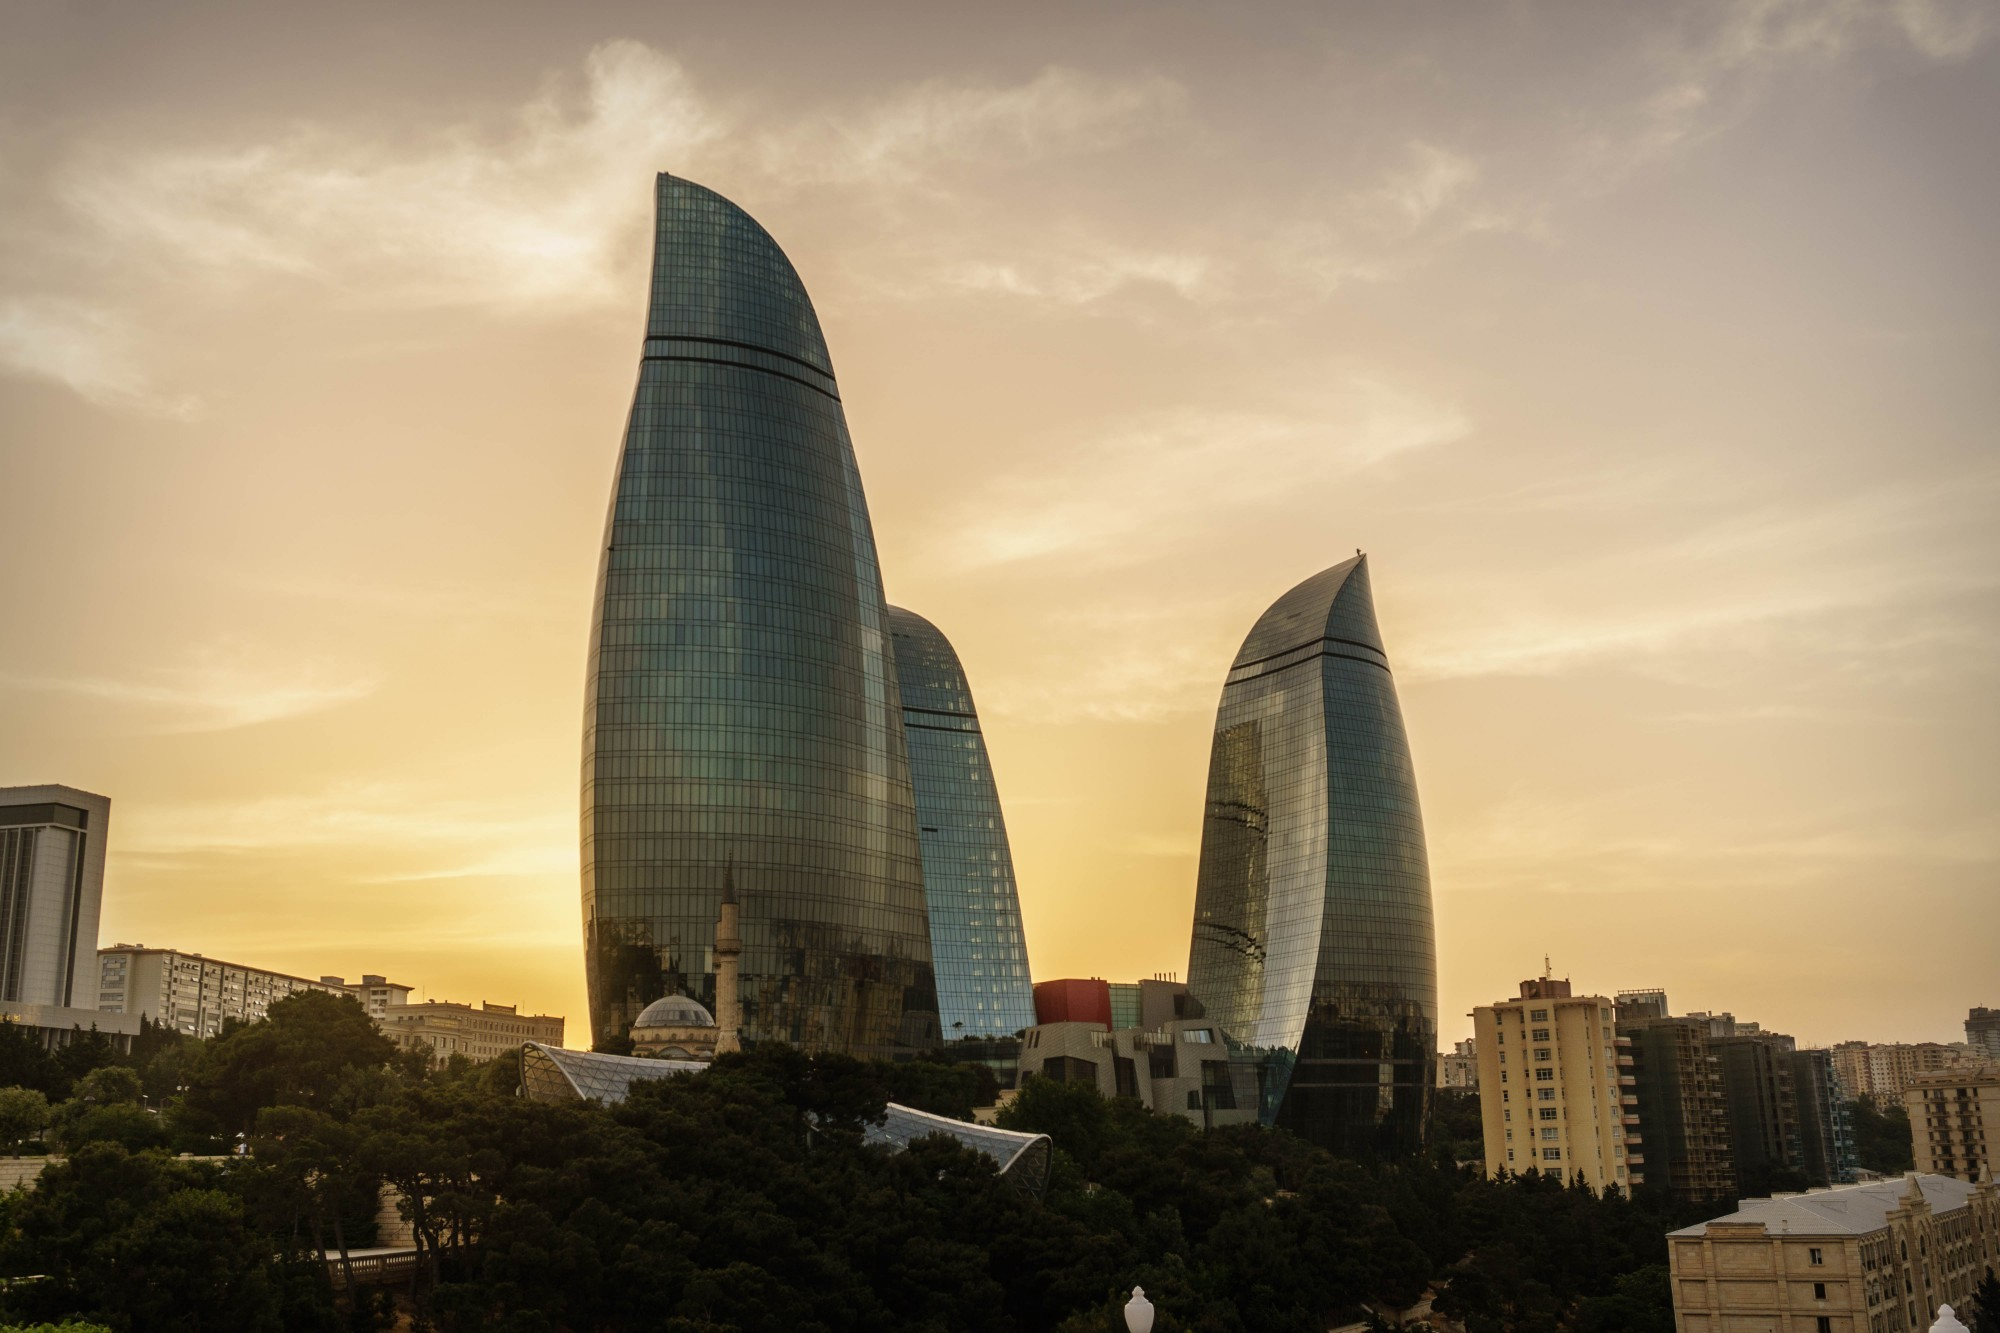 какую крыши домов фото в азербайджане меркам